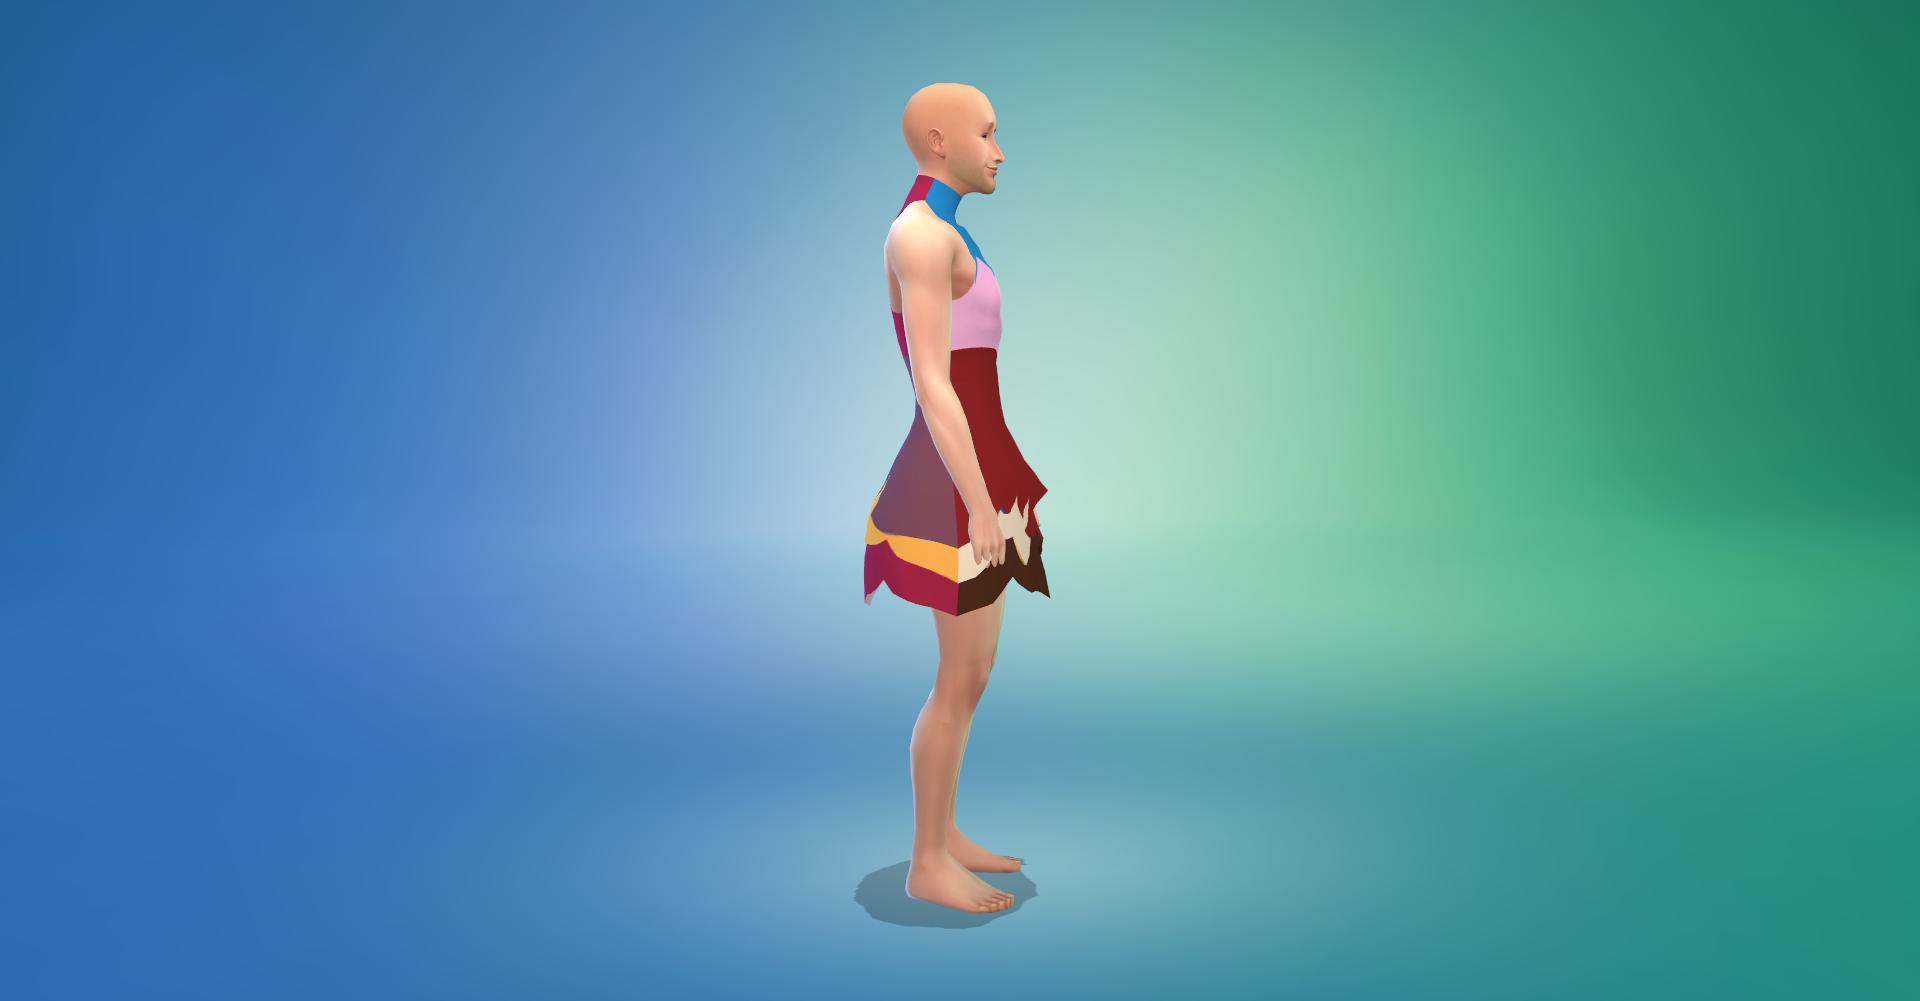 masc sim wearing dress